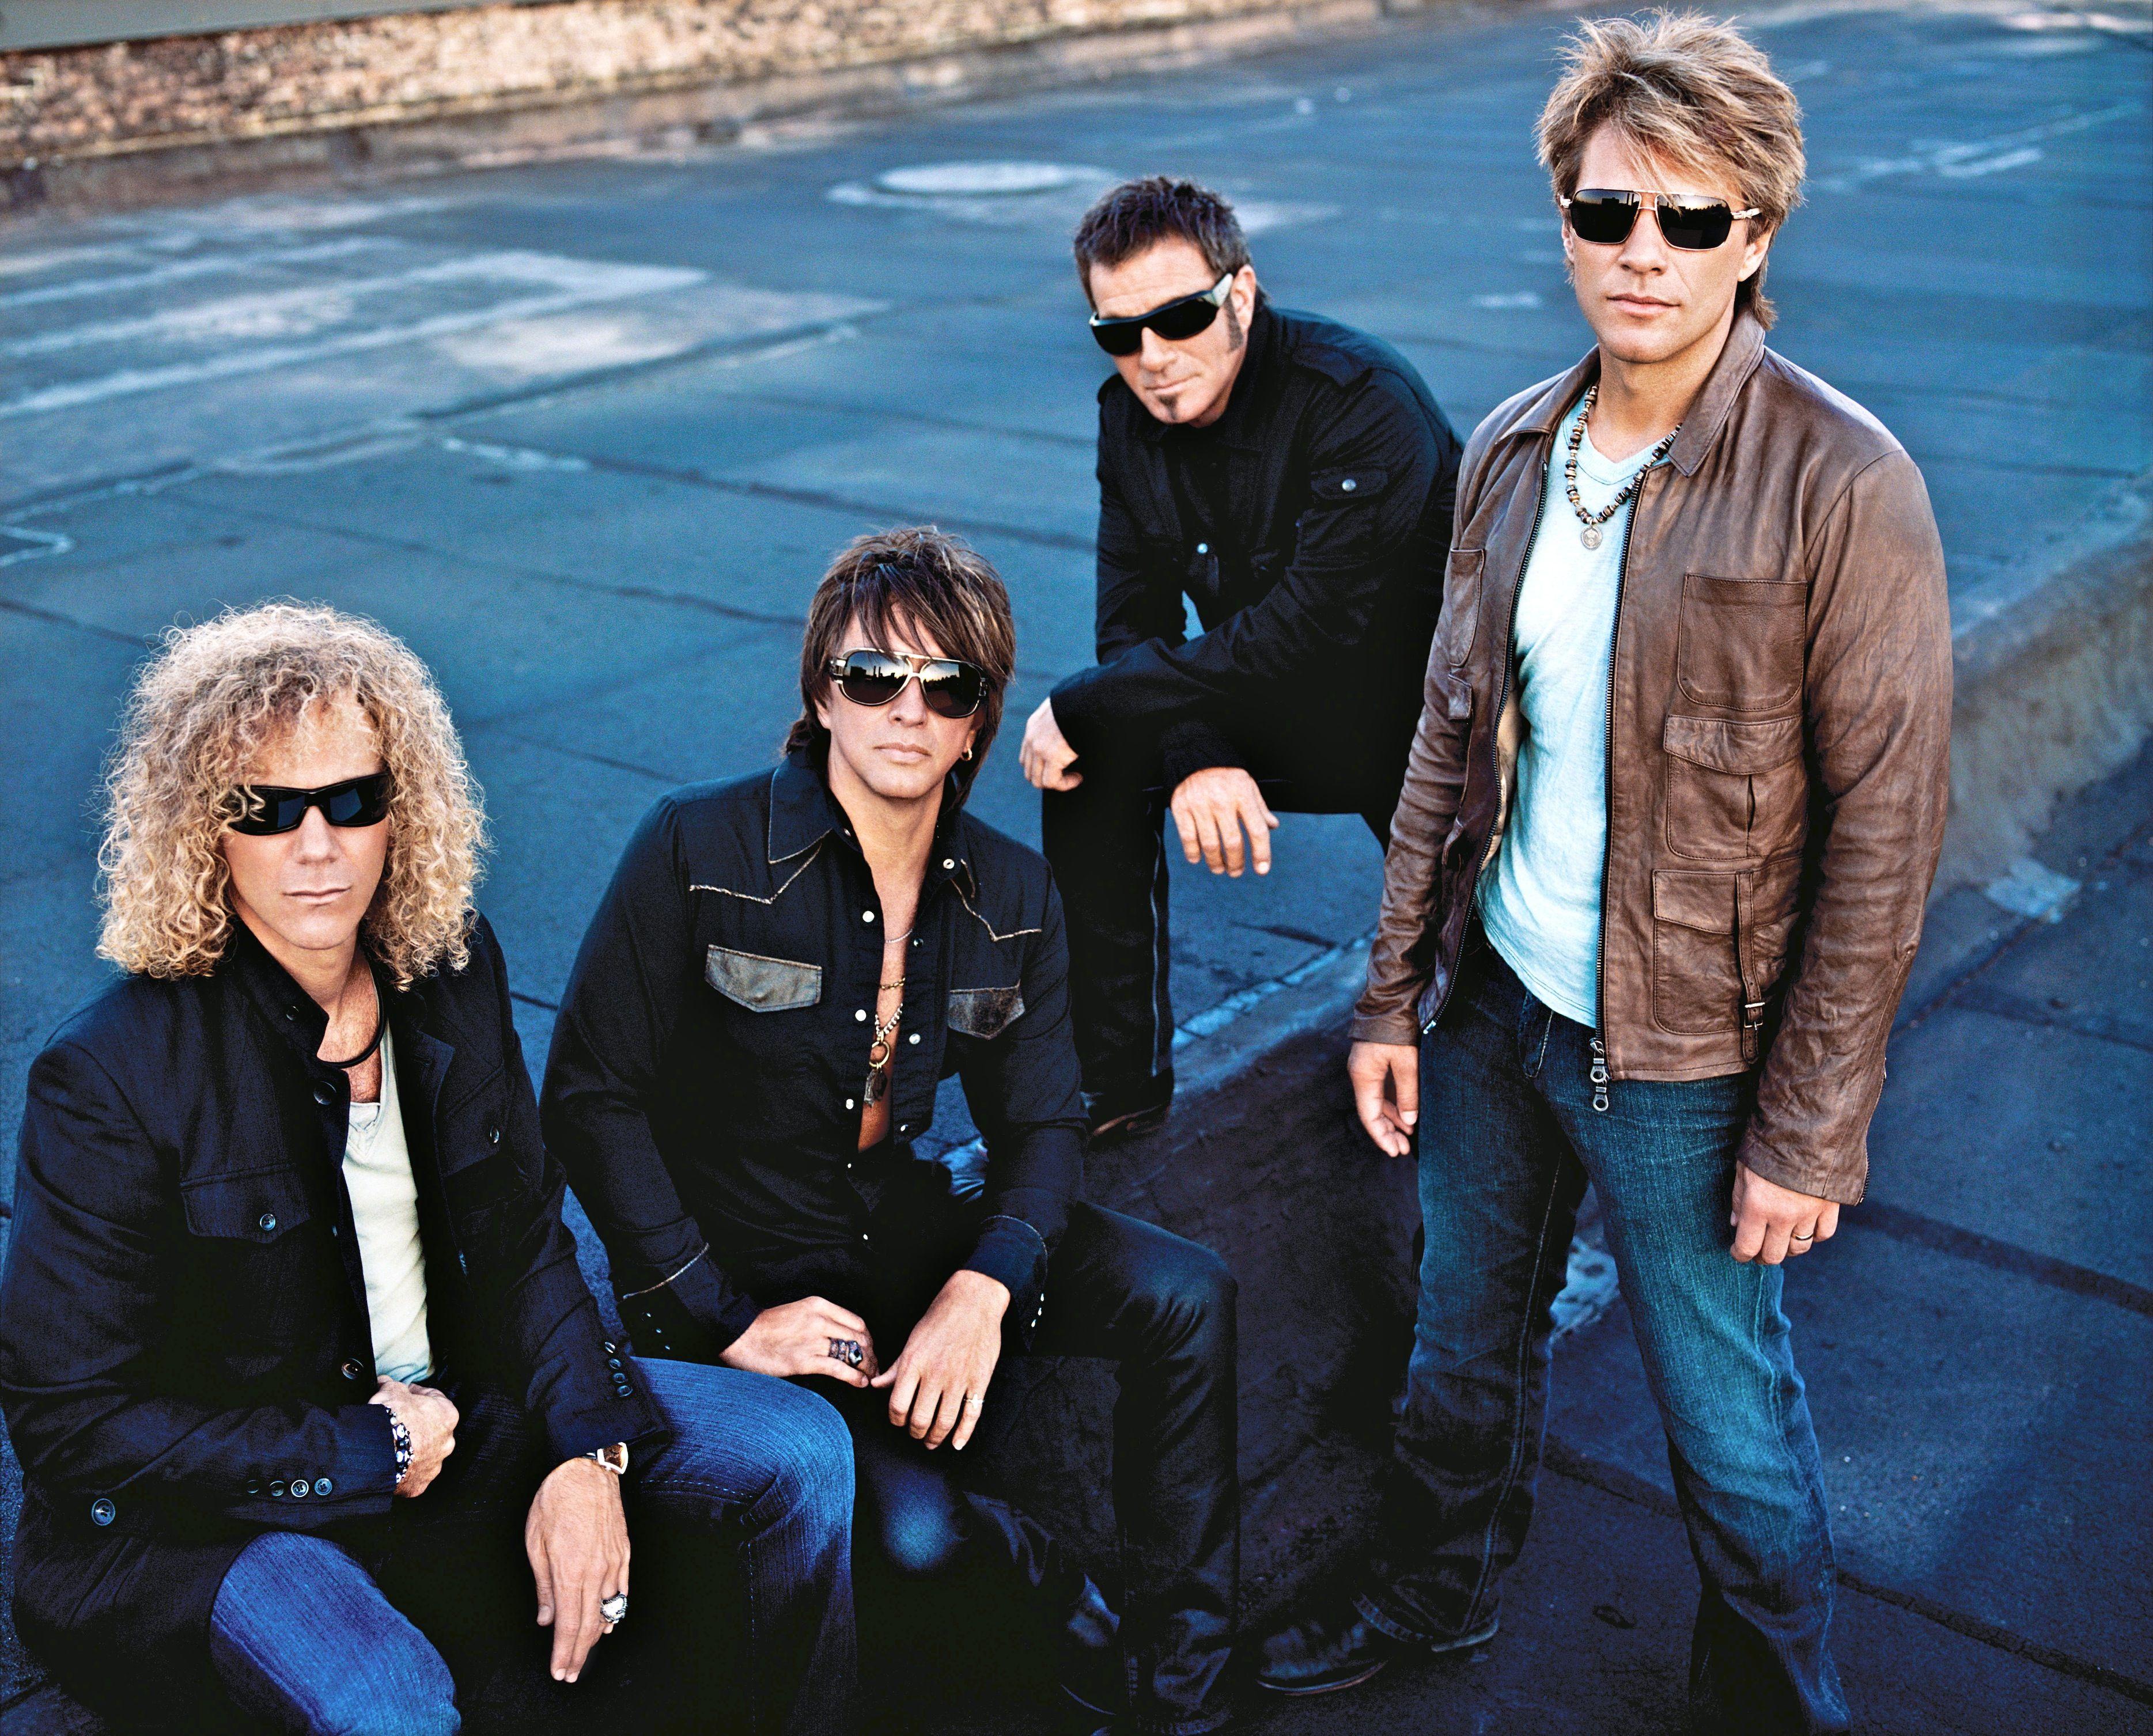 Bon Jovi | Music Artists | Pinterest | Bon jovi and Music artists